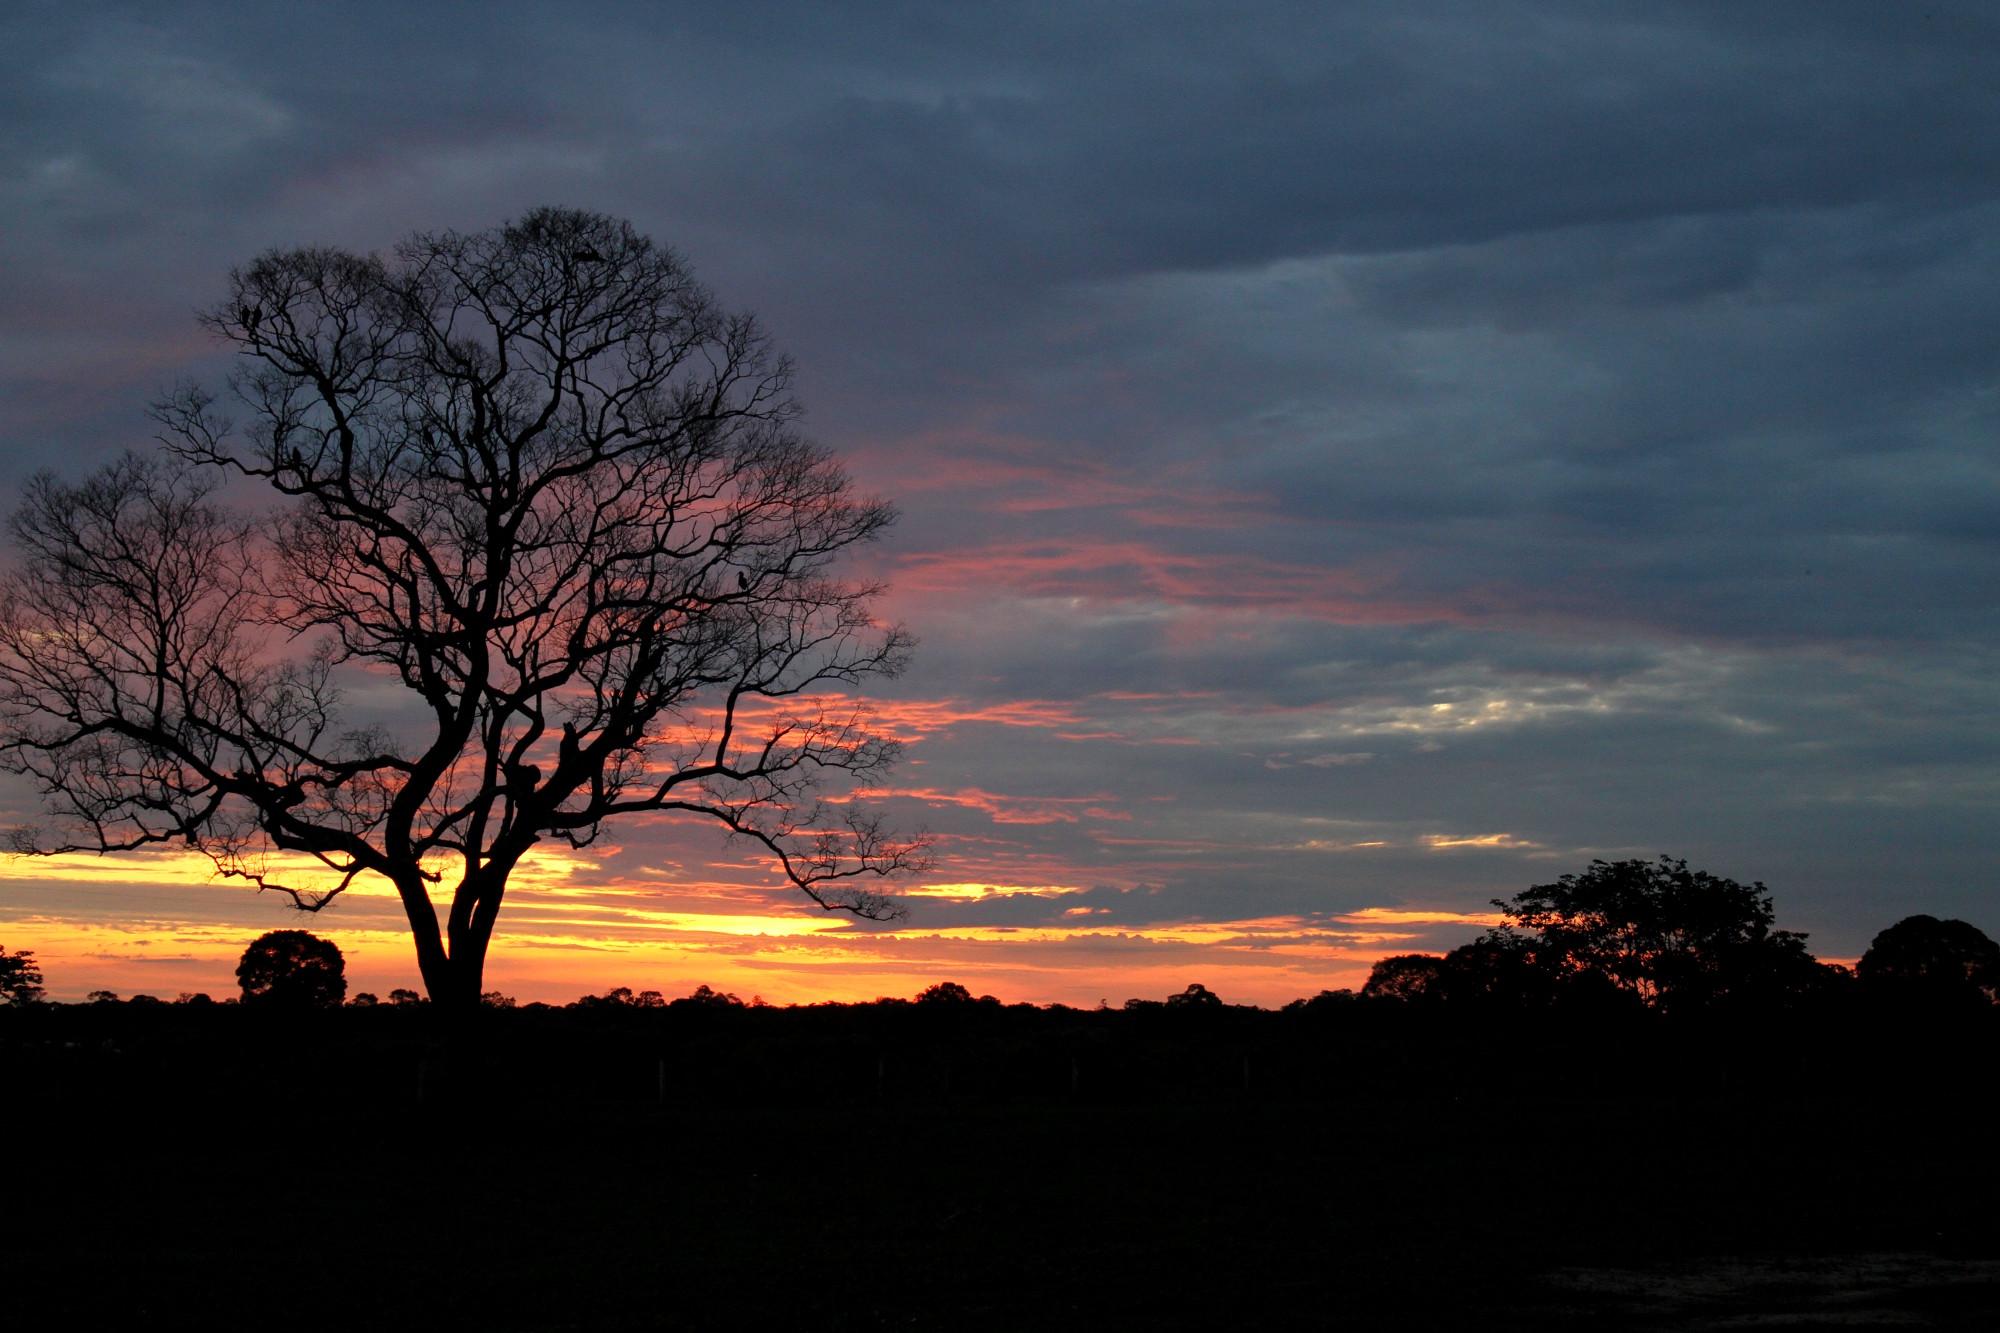 Melhor época para ir ao Pantanal